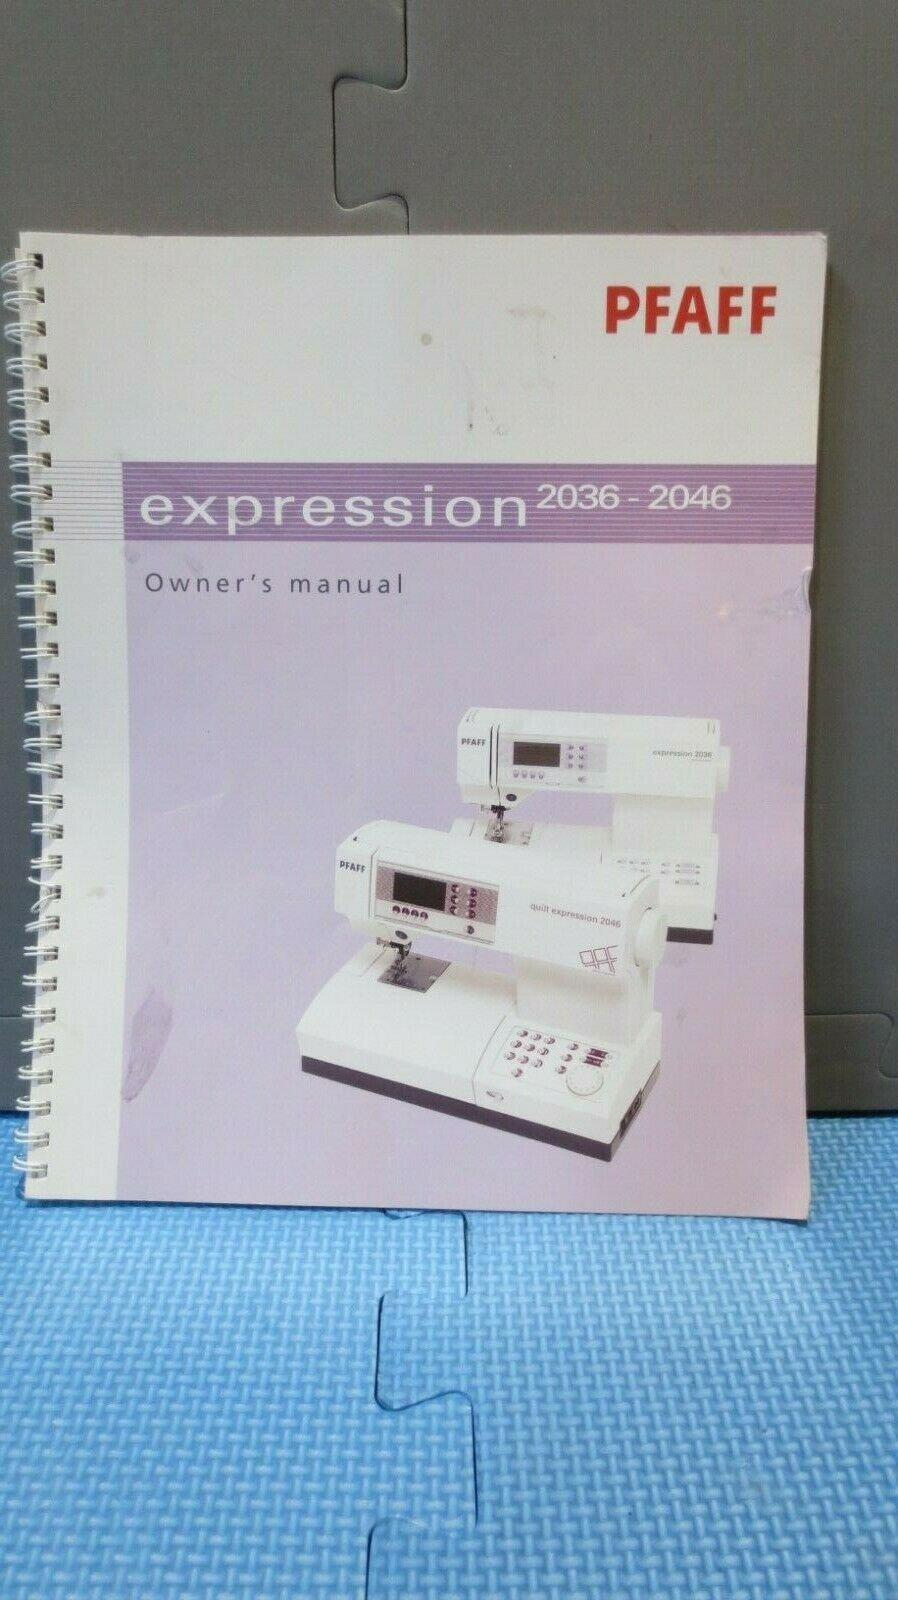 Pfaff manual for 2036/2046